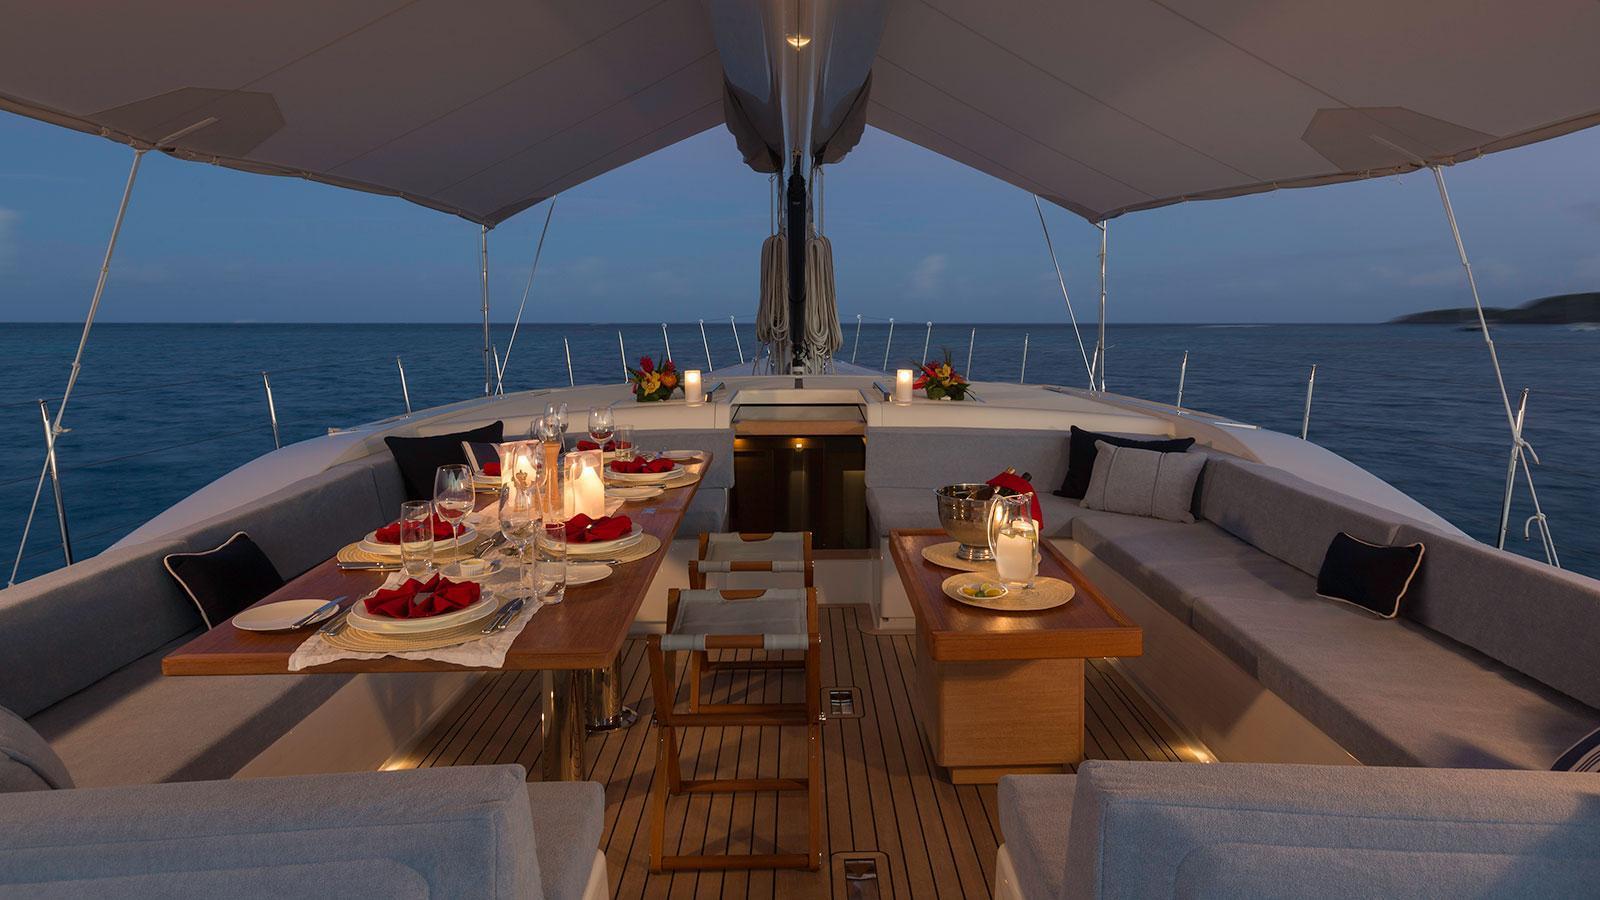 farfalla-sailing-yacht-southern-wind-2014-32m-exterior-dining